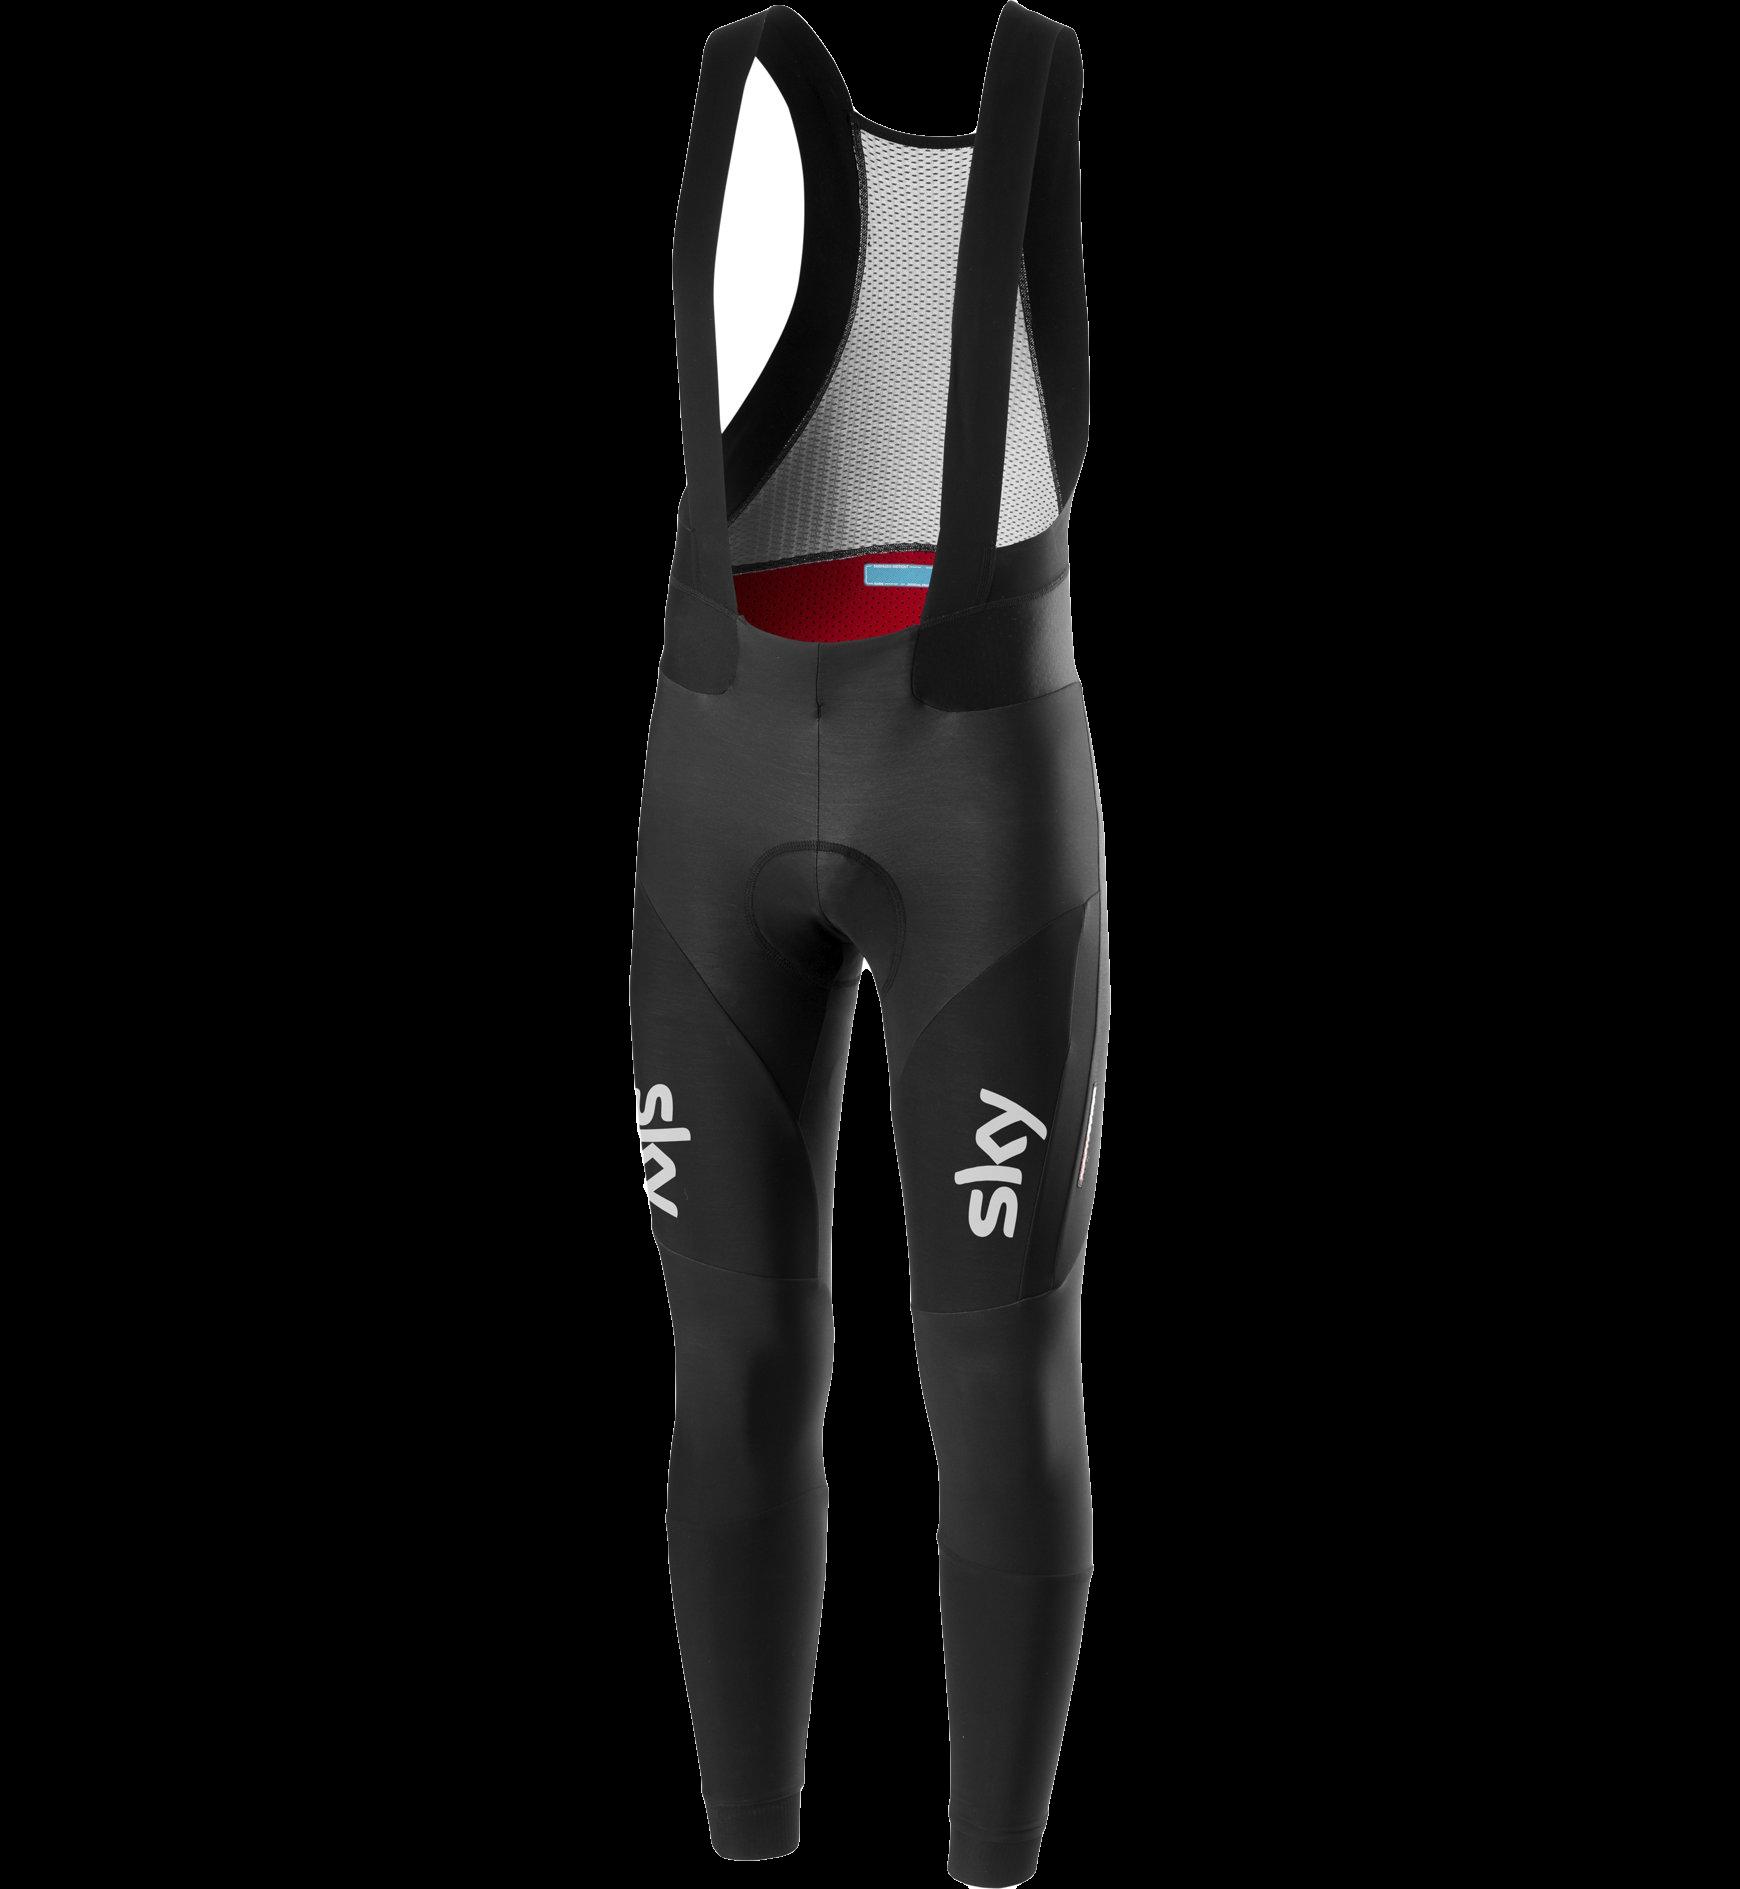 Castelli Team Sky 2019 Sorpasso 2 Bib - Trägerradhose lang - Herren